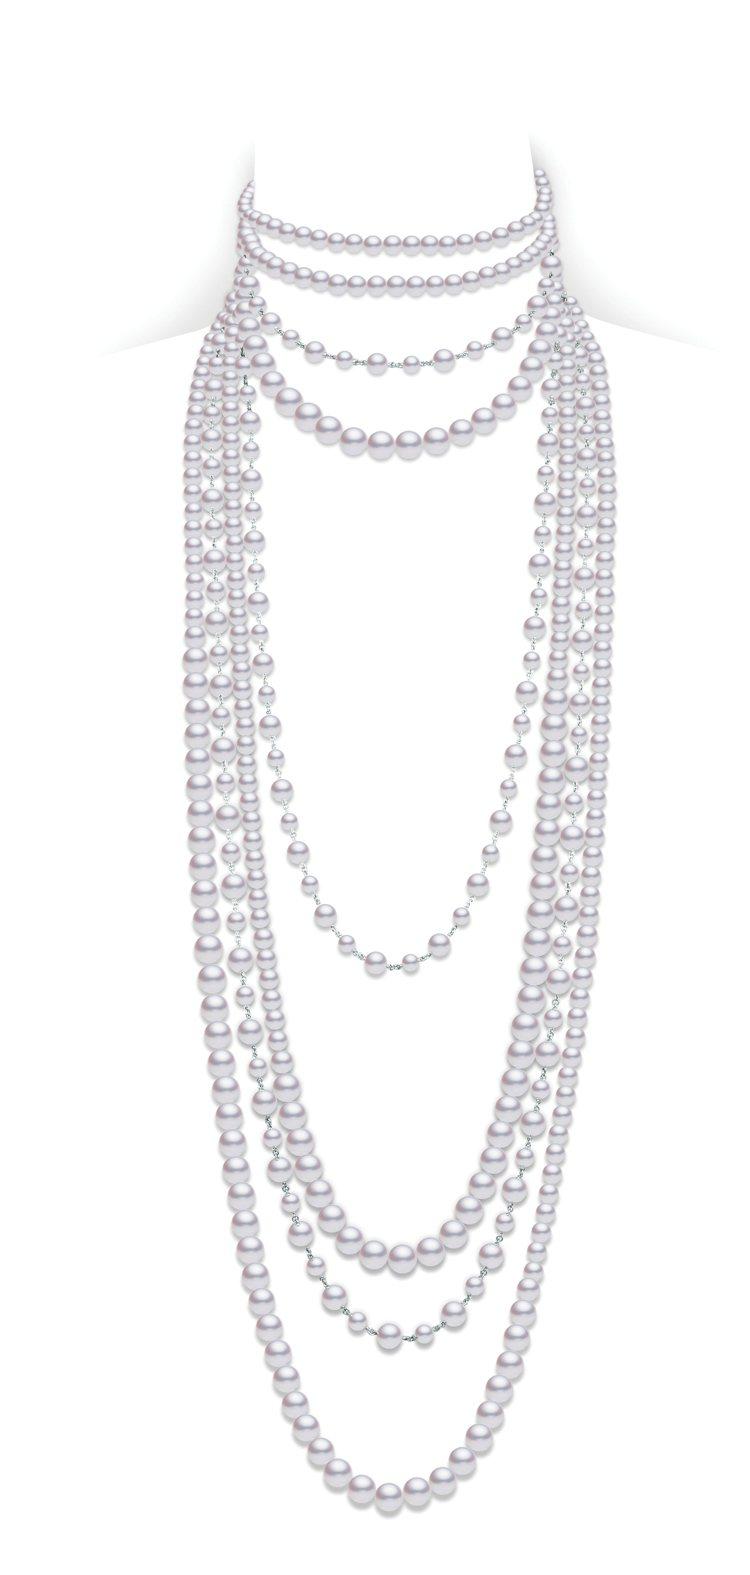 MIKIMOTO頂級珠寶系列多層次珍珠鑽石項鍊,價格店洽。圖/MIKIMOTO提...